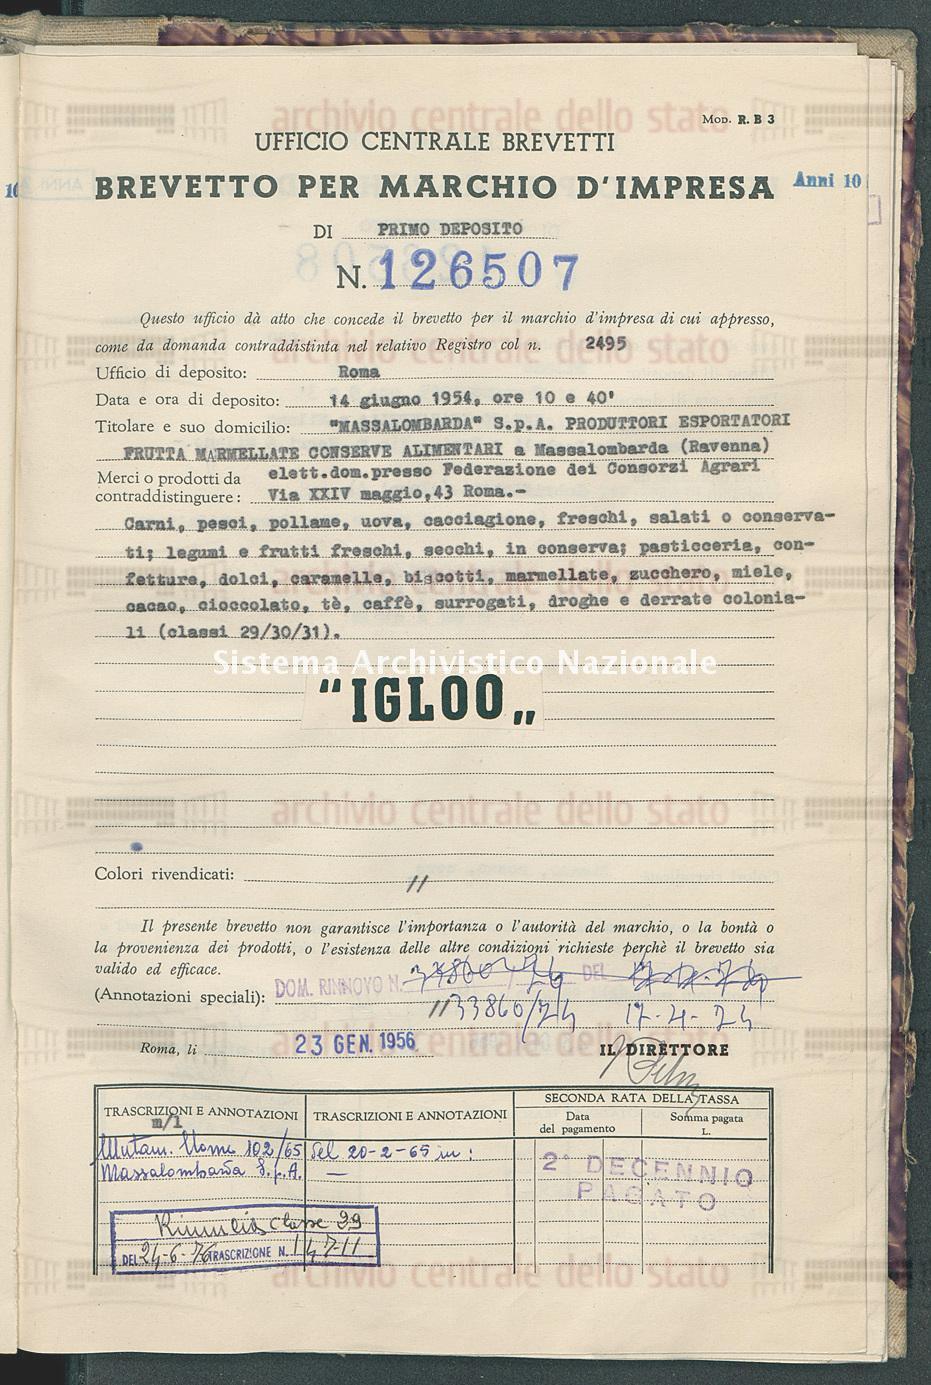 'Massalombarda' S.P.A. Produttori Esportatori Frutta Marmellate Conserve Alimentari (23/01/1956)